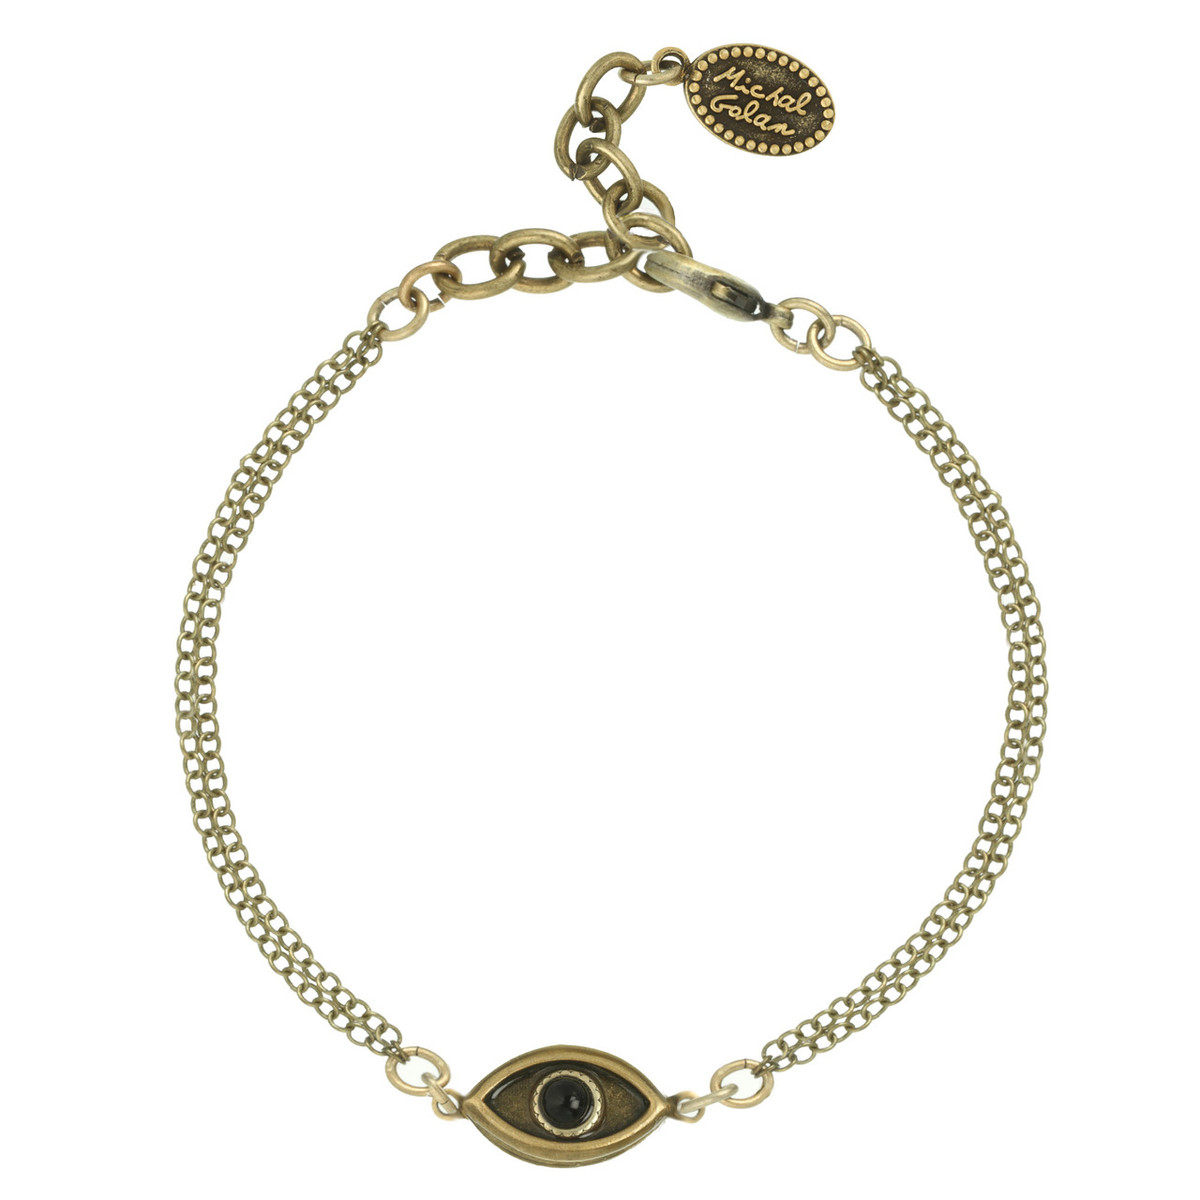 Evil Eye with Onyx Center bracelet from Michal Golan Jewelry